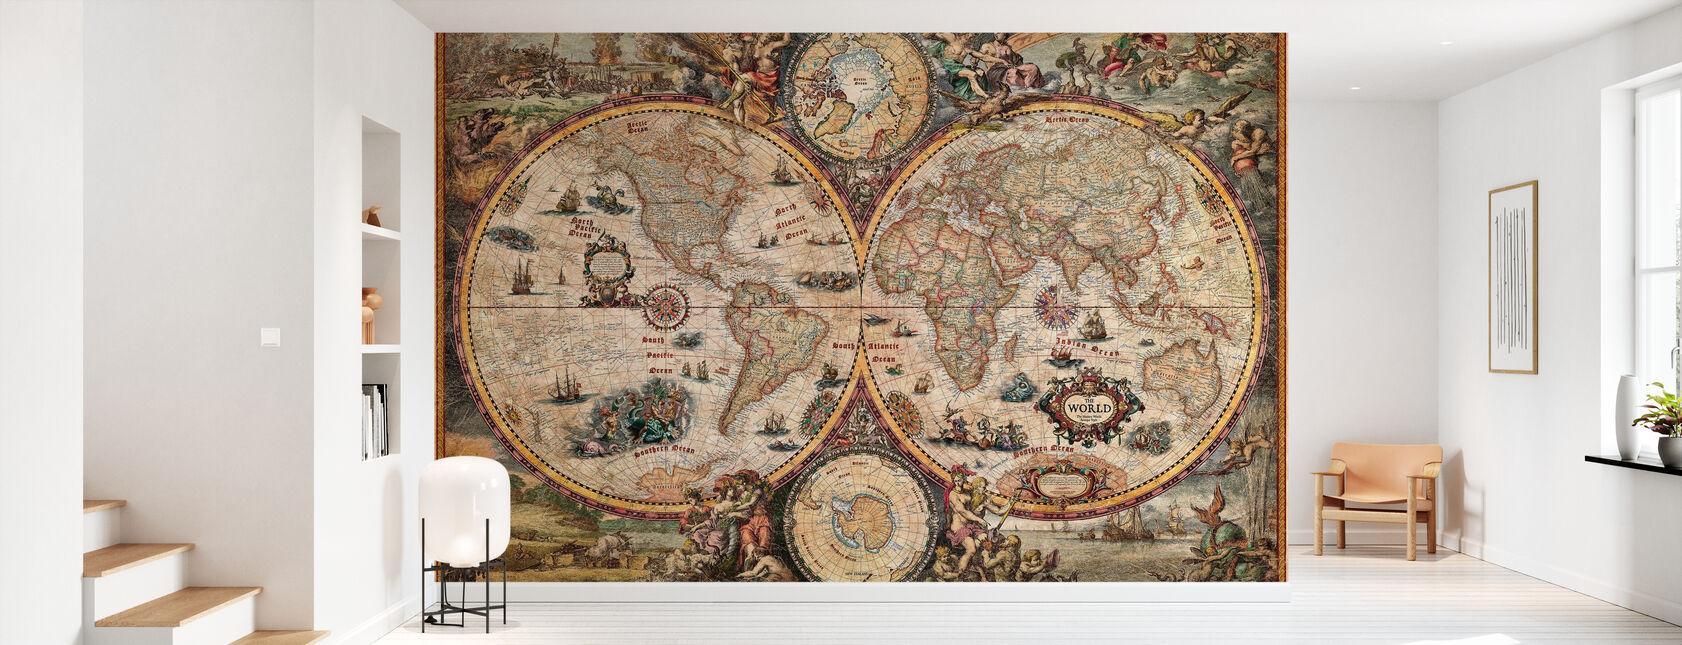 Vintage World Map - Wallpaper - Hallway